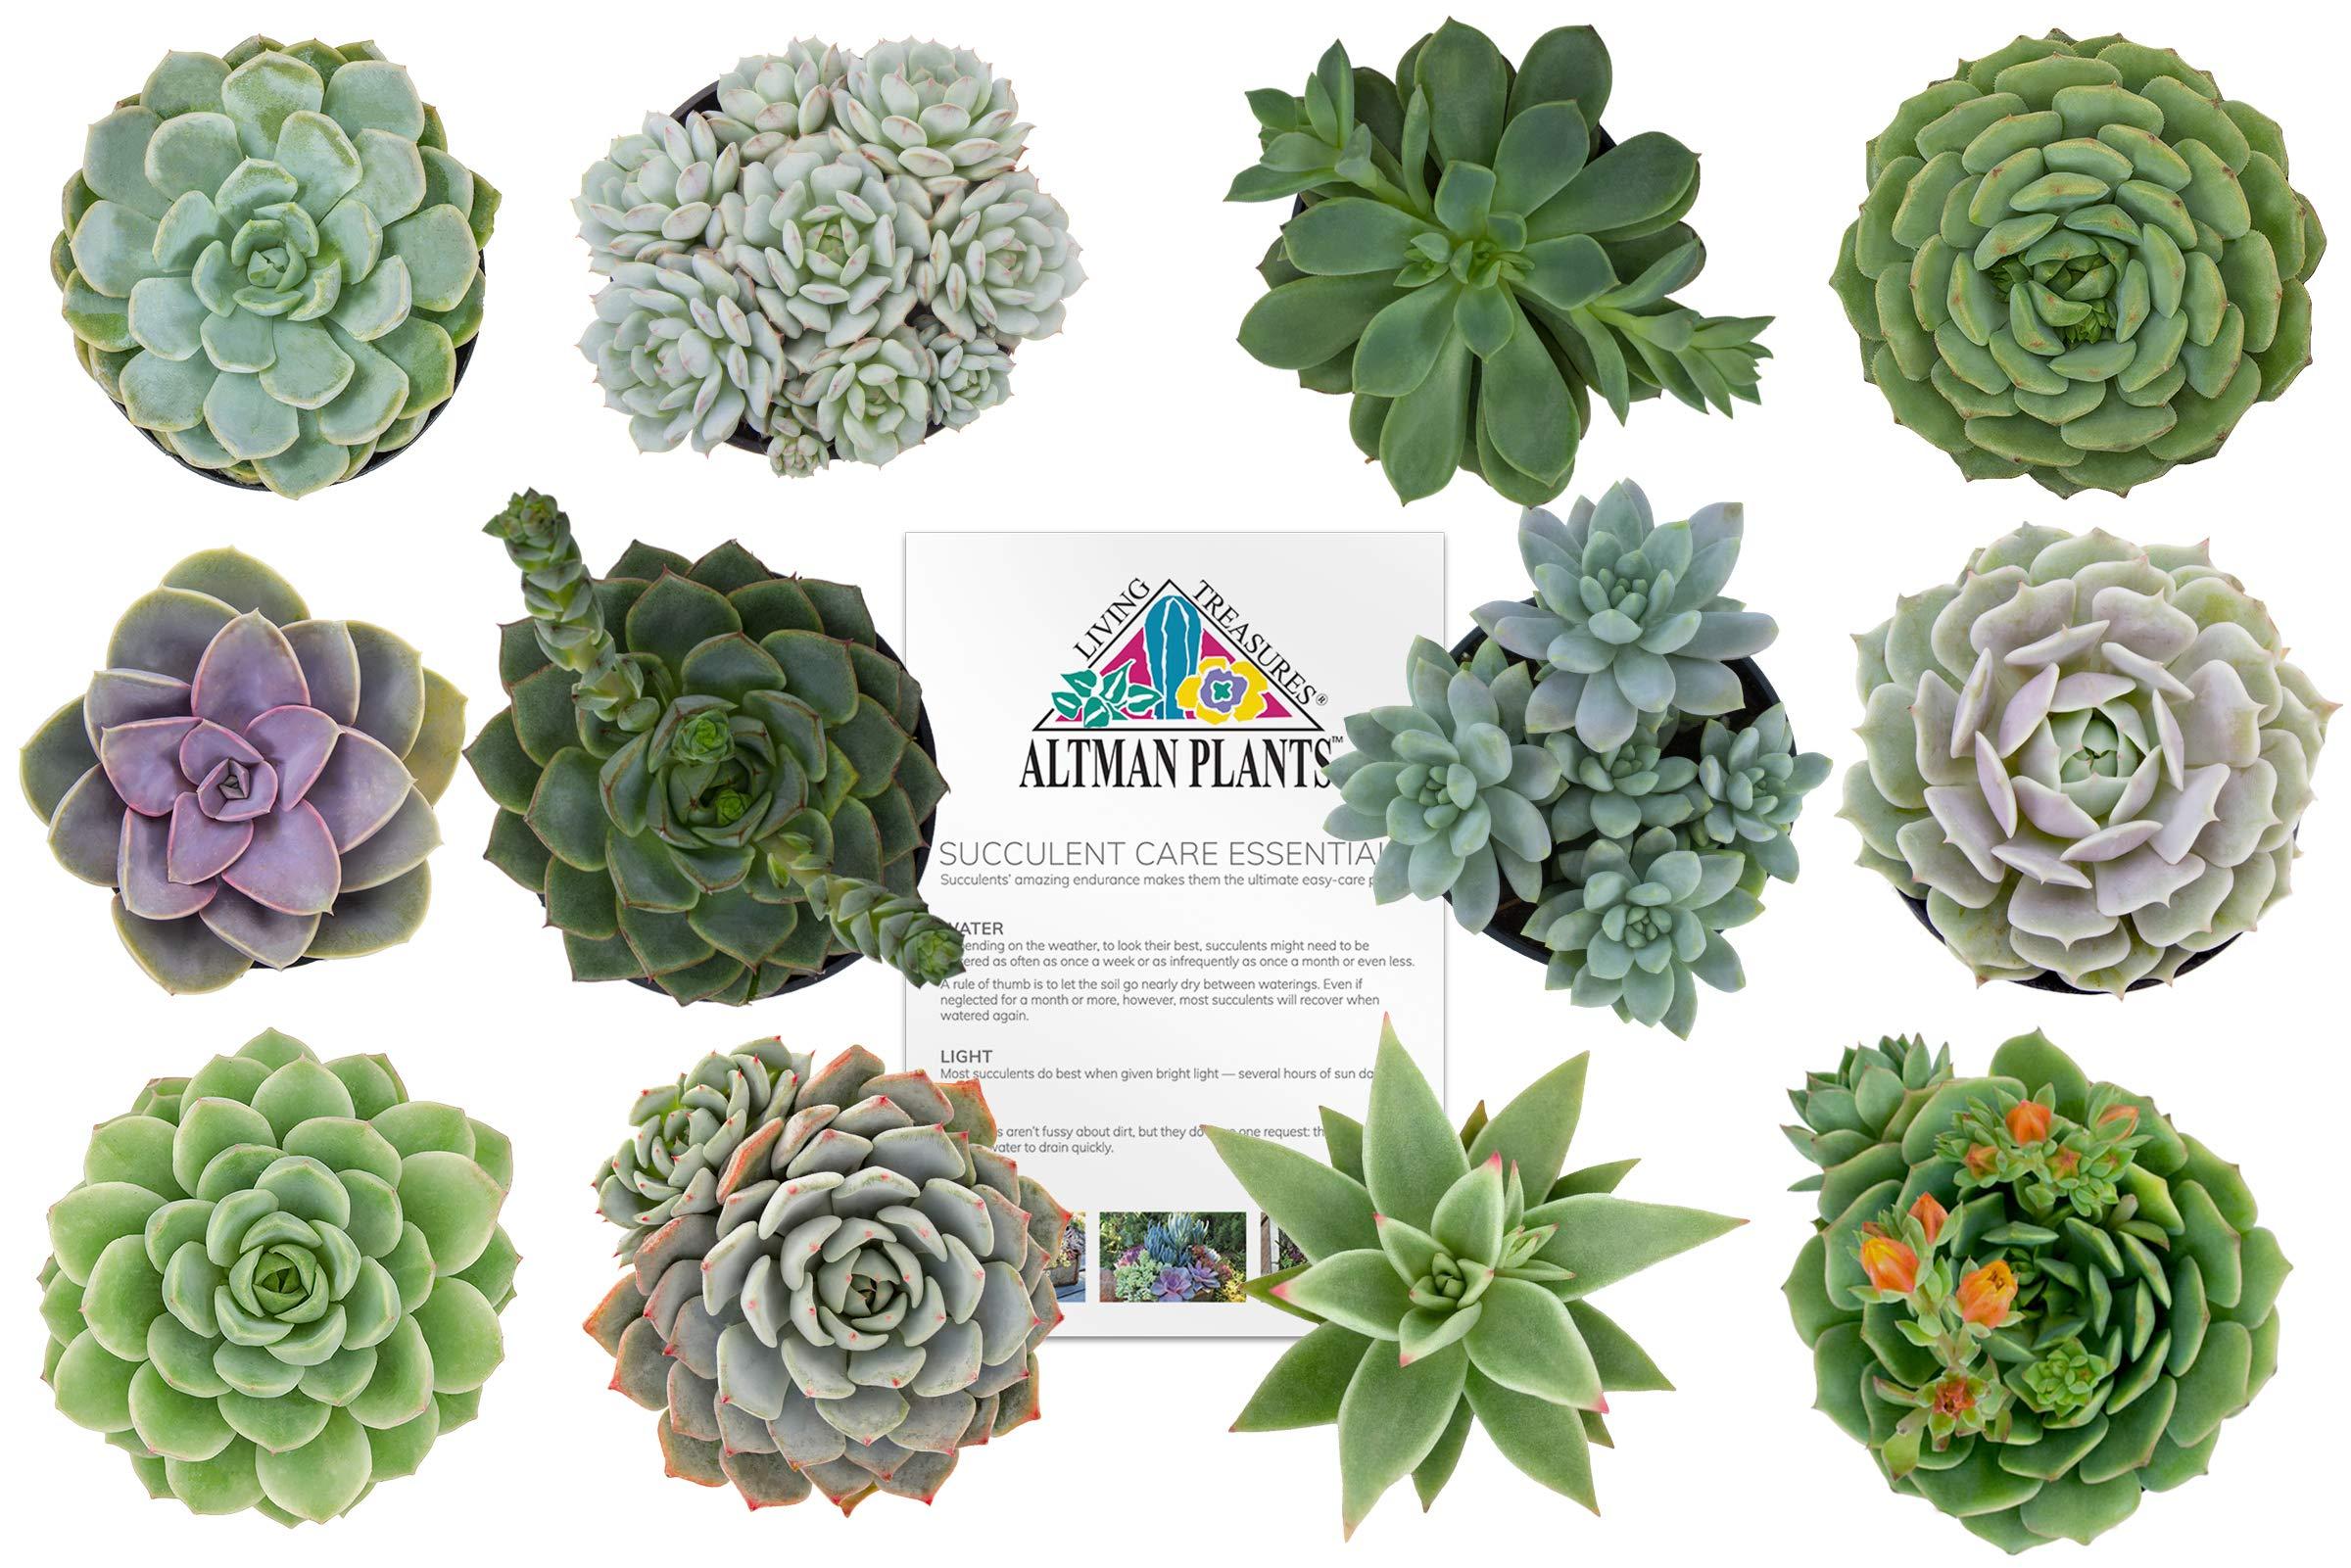 Altman Plants Assorted Live Succulents Flowering Rosette Collection Echeveria, sedeveria, perfect for party favors and arrangements, 2.5'', 12 Pack